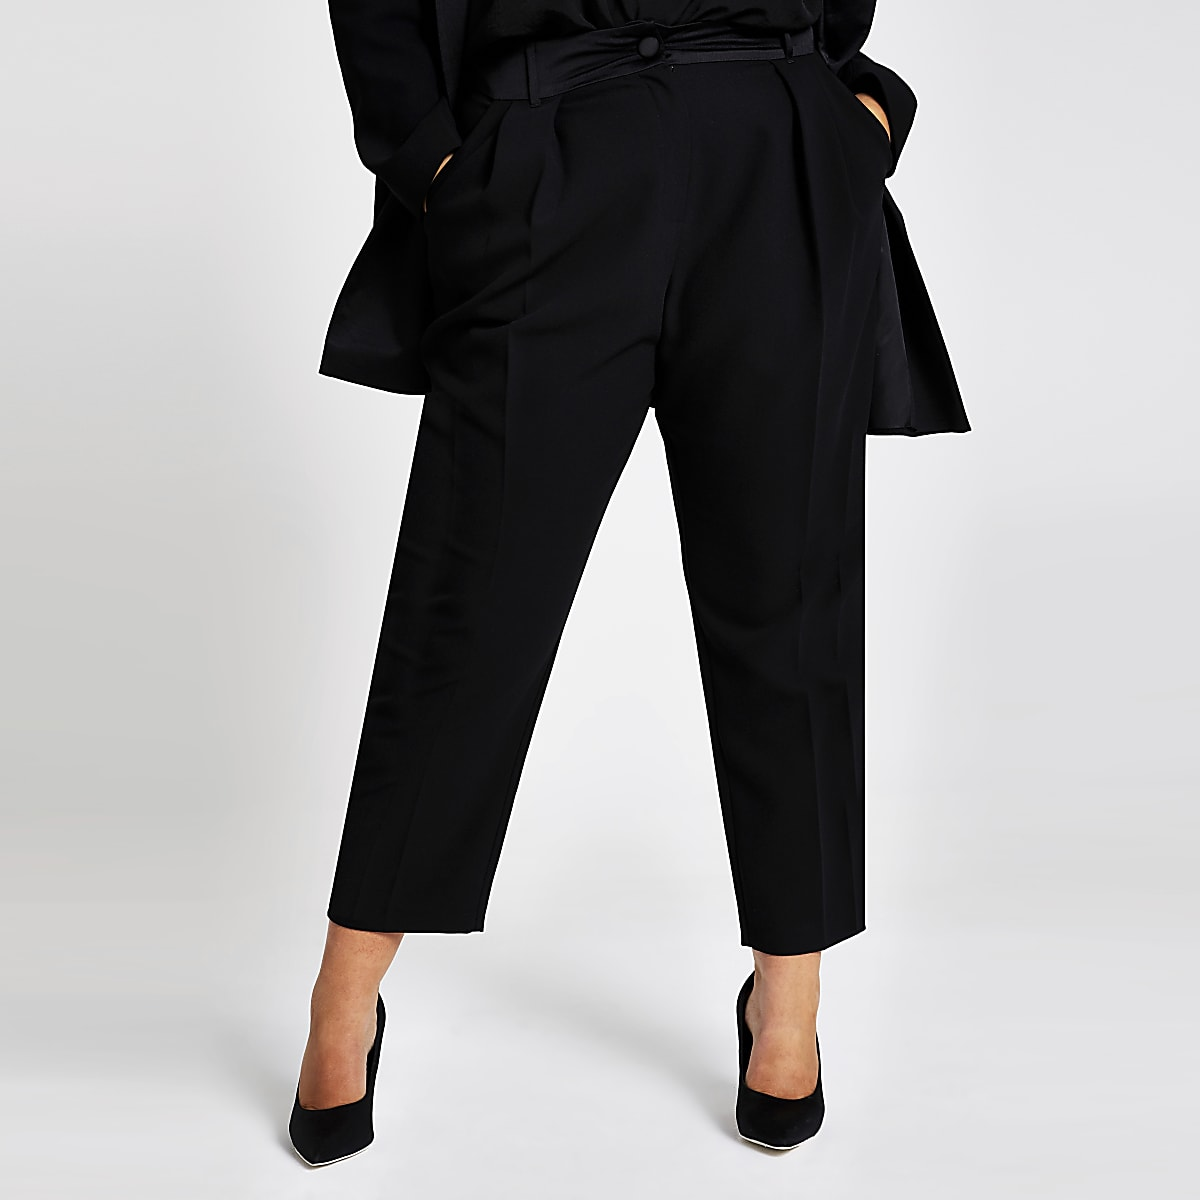 RI Plus - Zwarte smaltoelopende smokingbroek met hoge taille